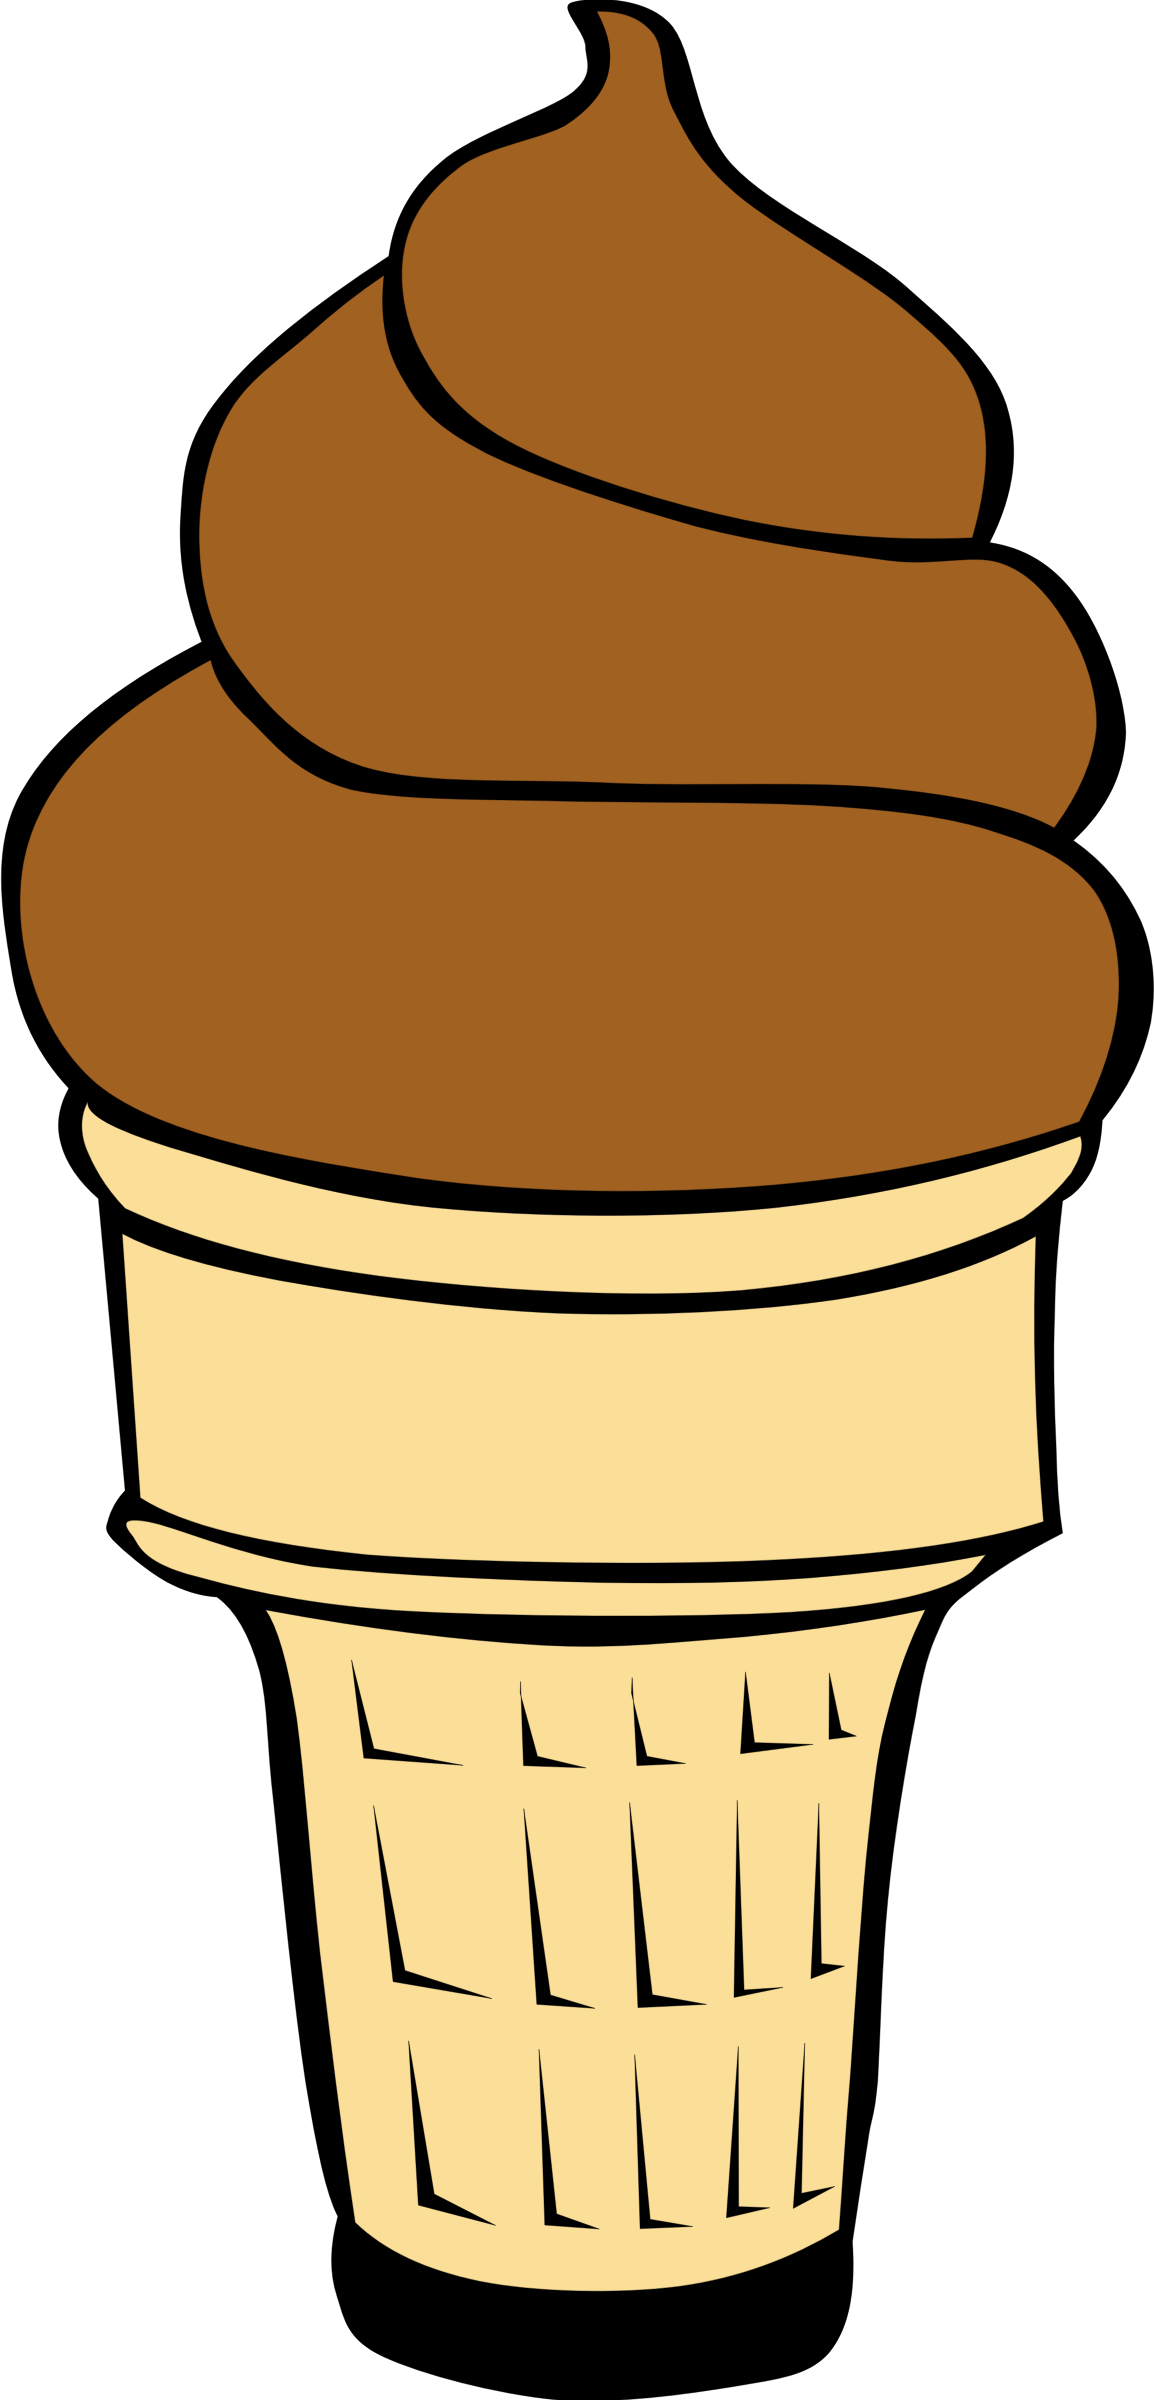 Fast food ice cream. Desserts clipart different